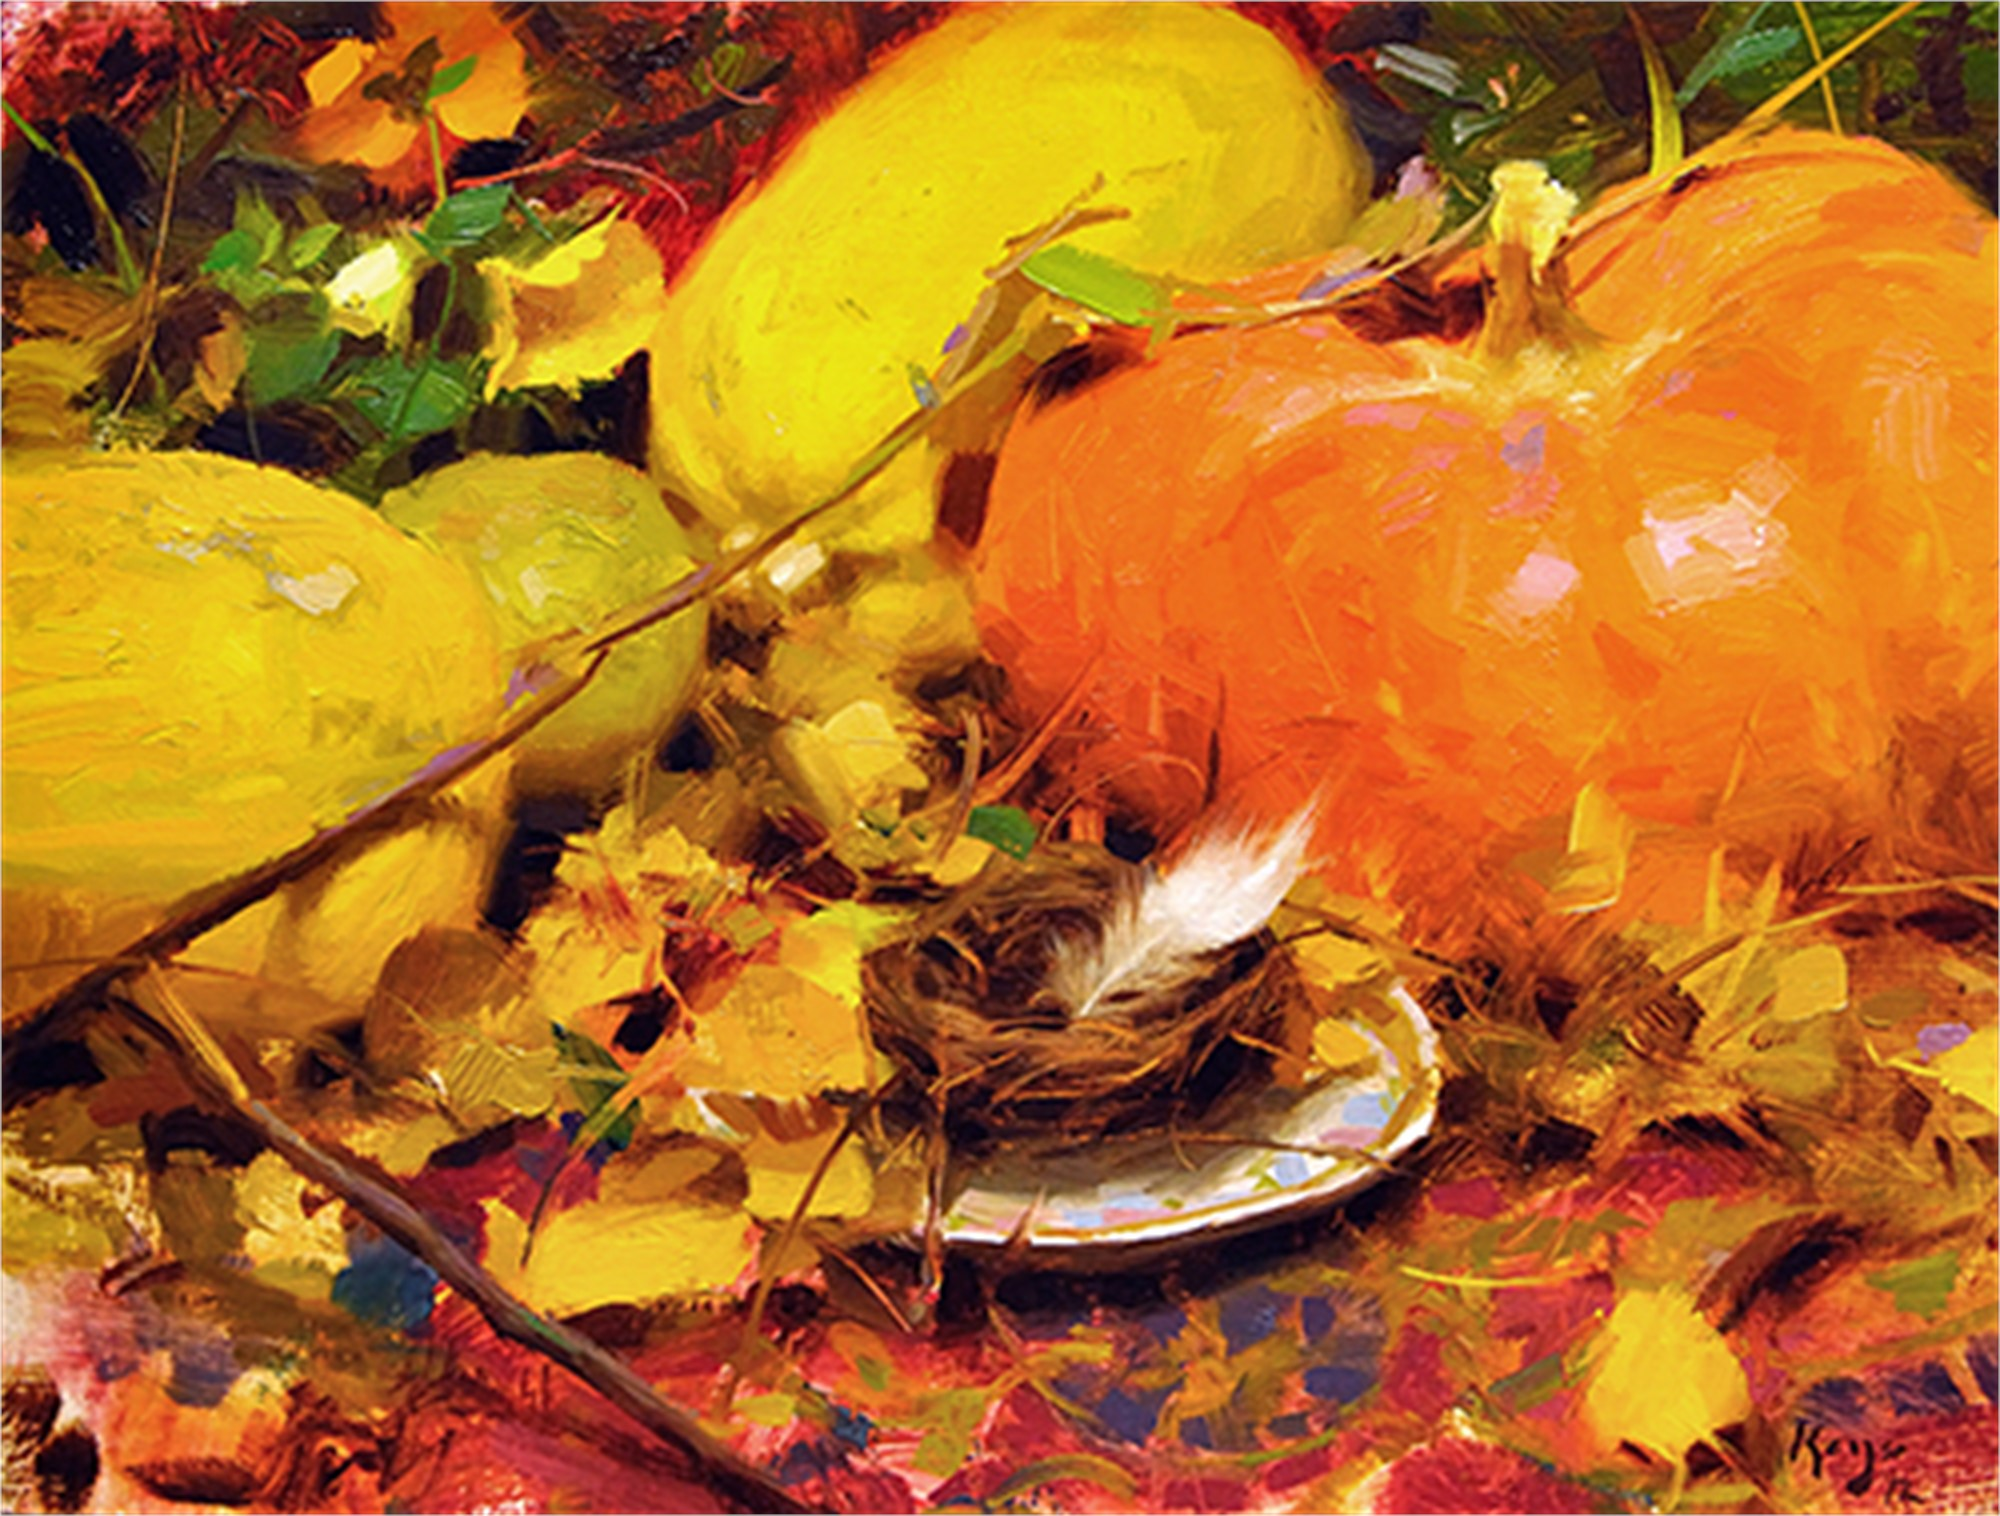 Autumn Nest by Daniel Keys